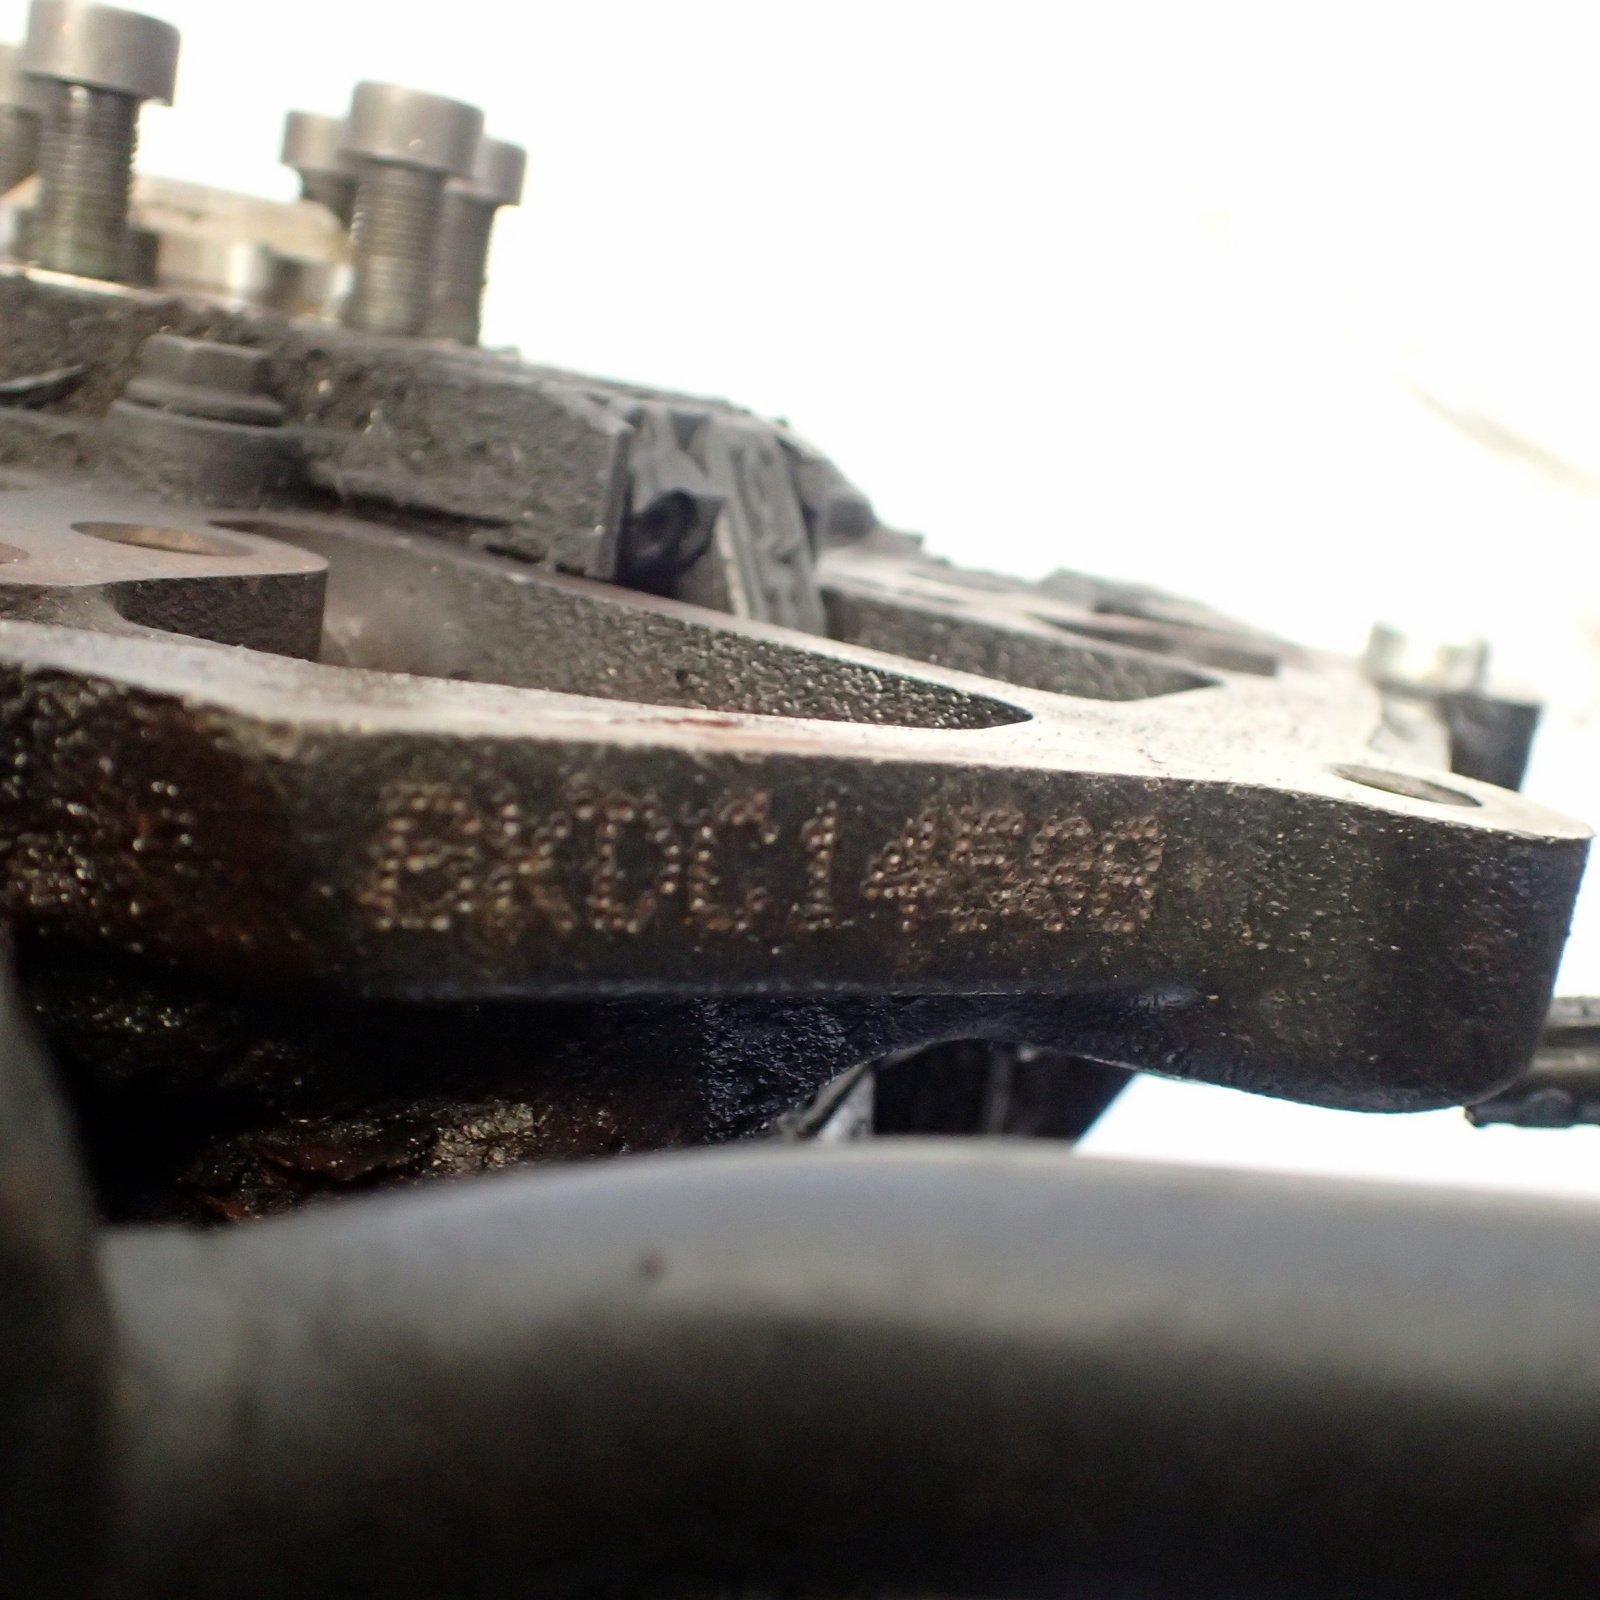 Engine-Bare-BKD-Ref-1252-VW-Touran-mk1-2-0-Tdi thumbnail 4